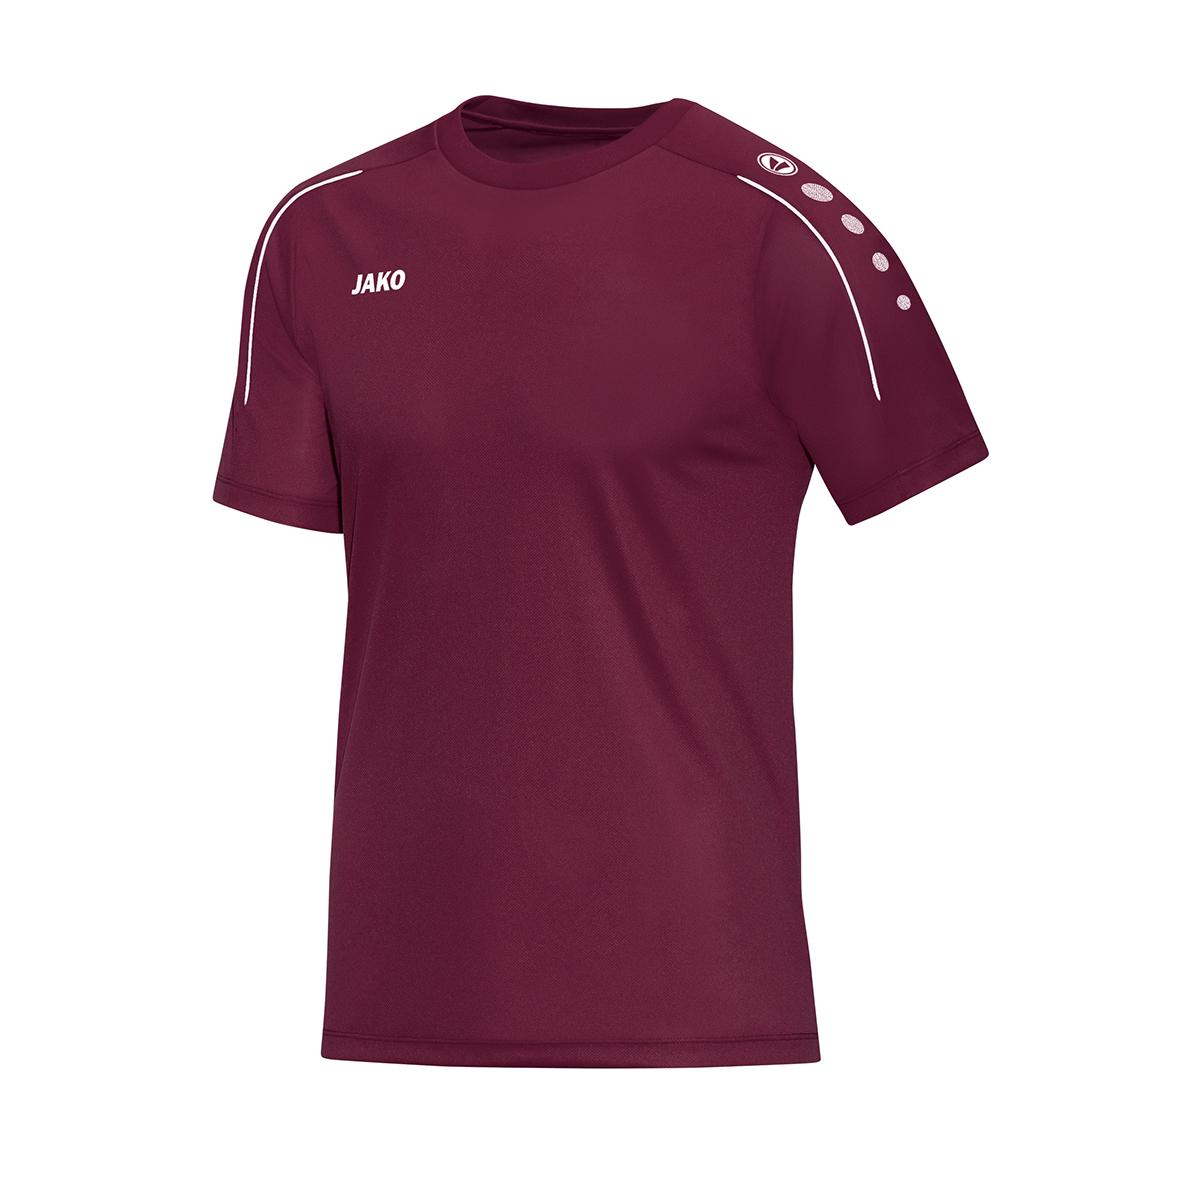 JAKO T-Shirt Classico Herren